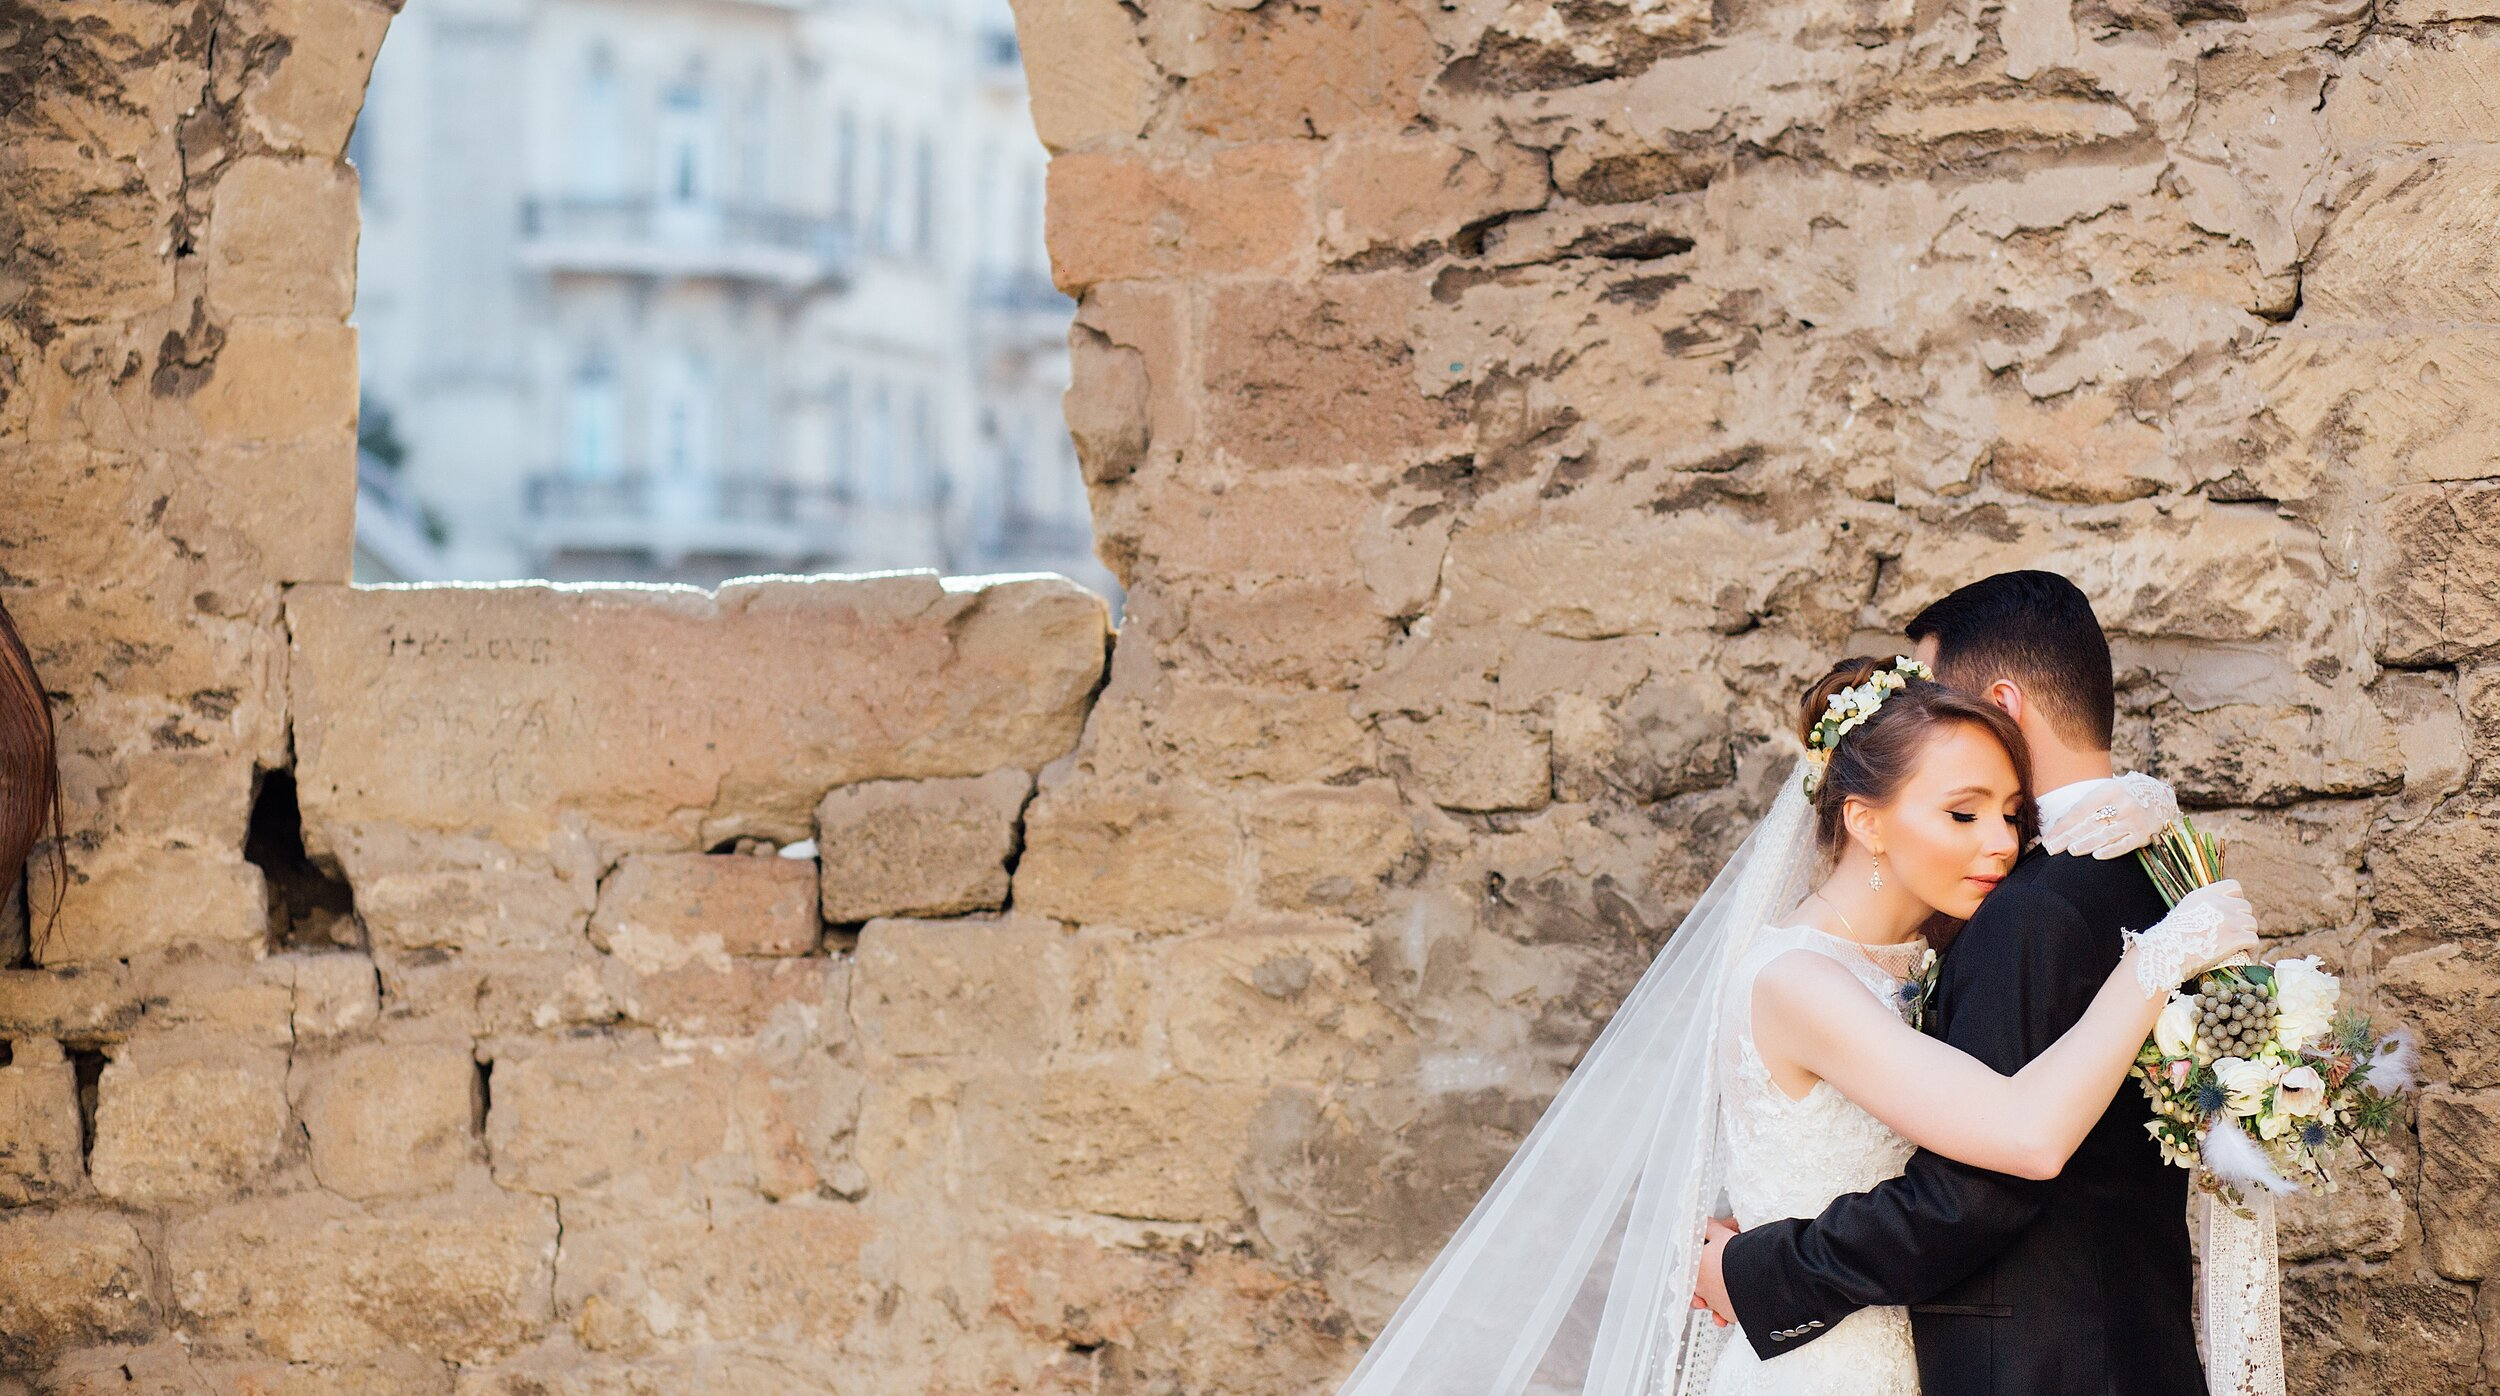 Marriage-unsplash.jpg